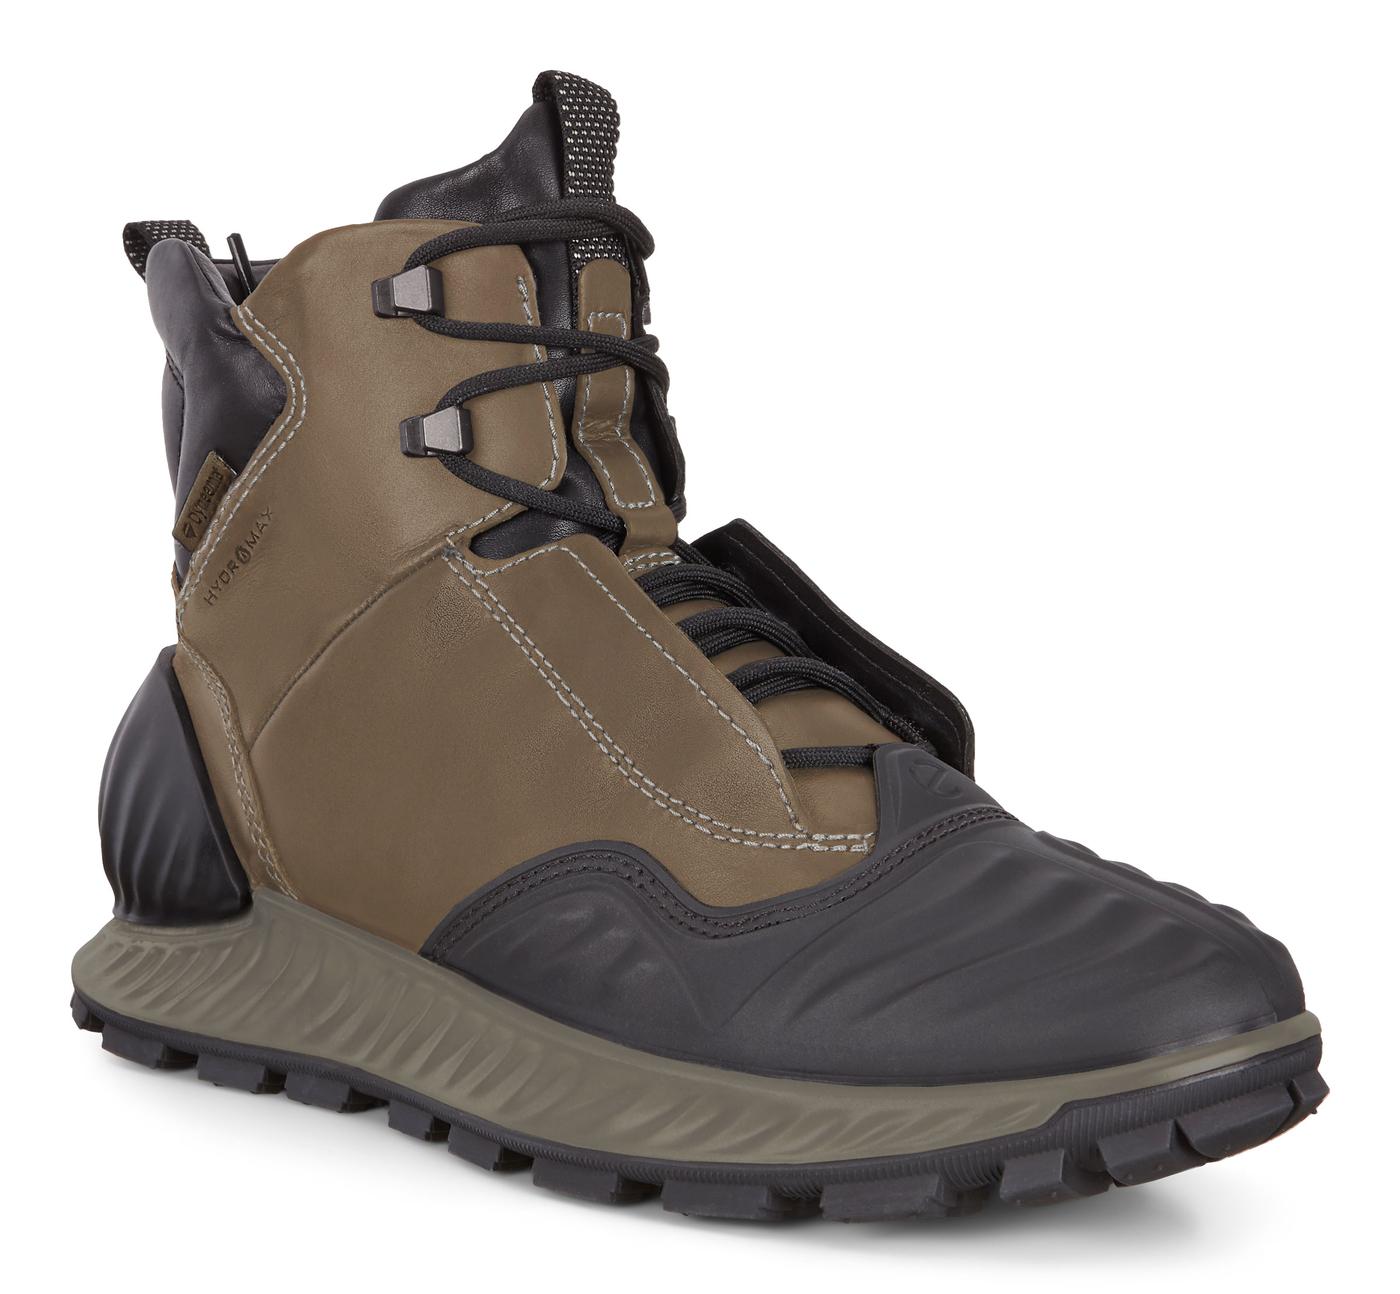 ECCO EXOSTRIKE Mens Outdoor Boot with MICHELIN Sole HM